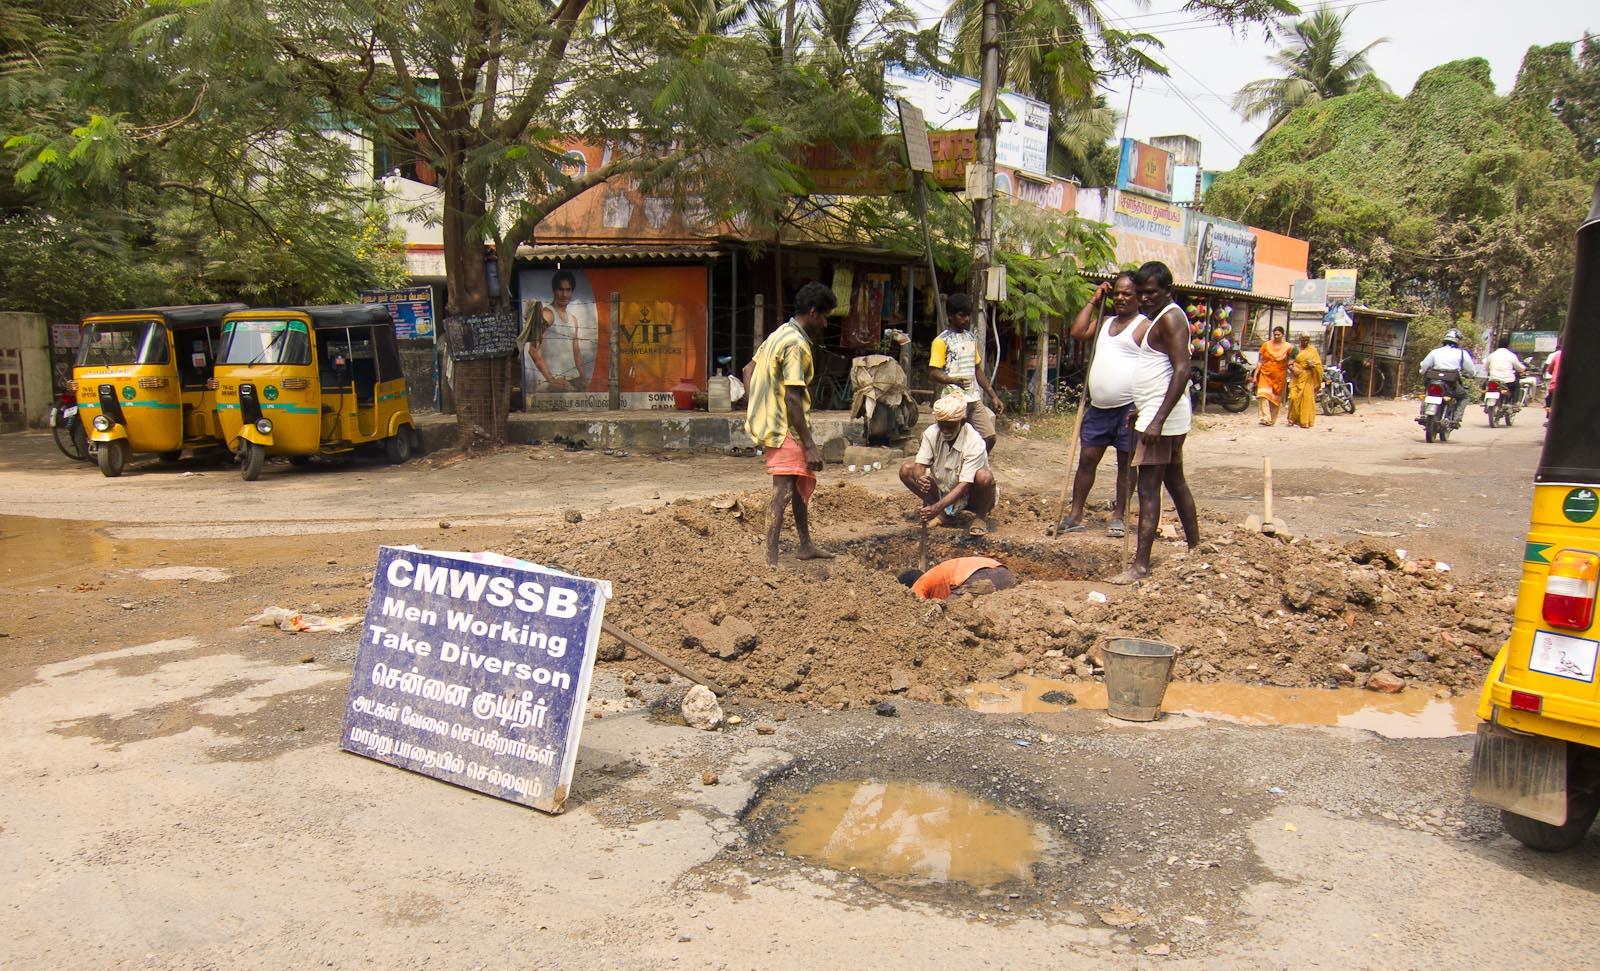 180211_mamallapuram_221